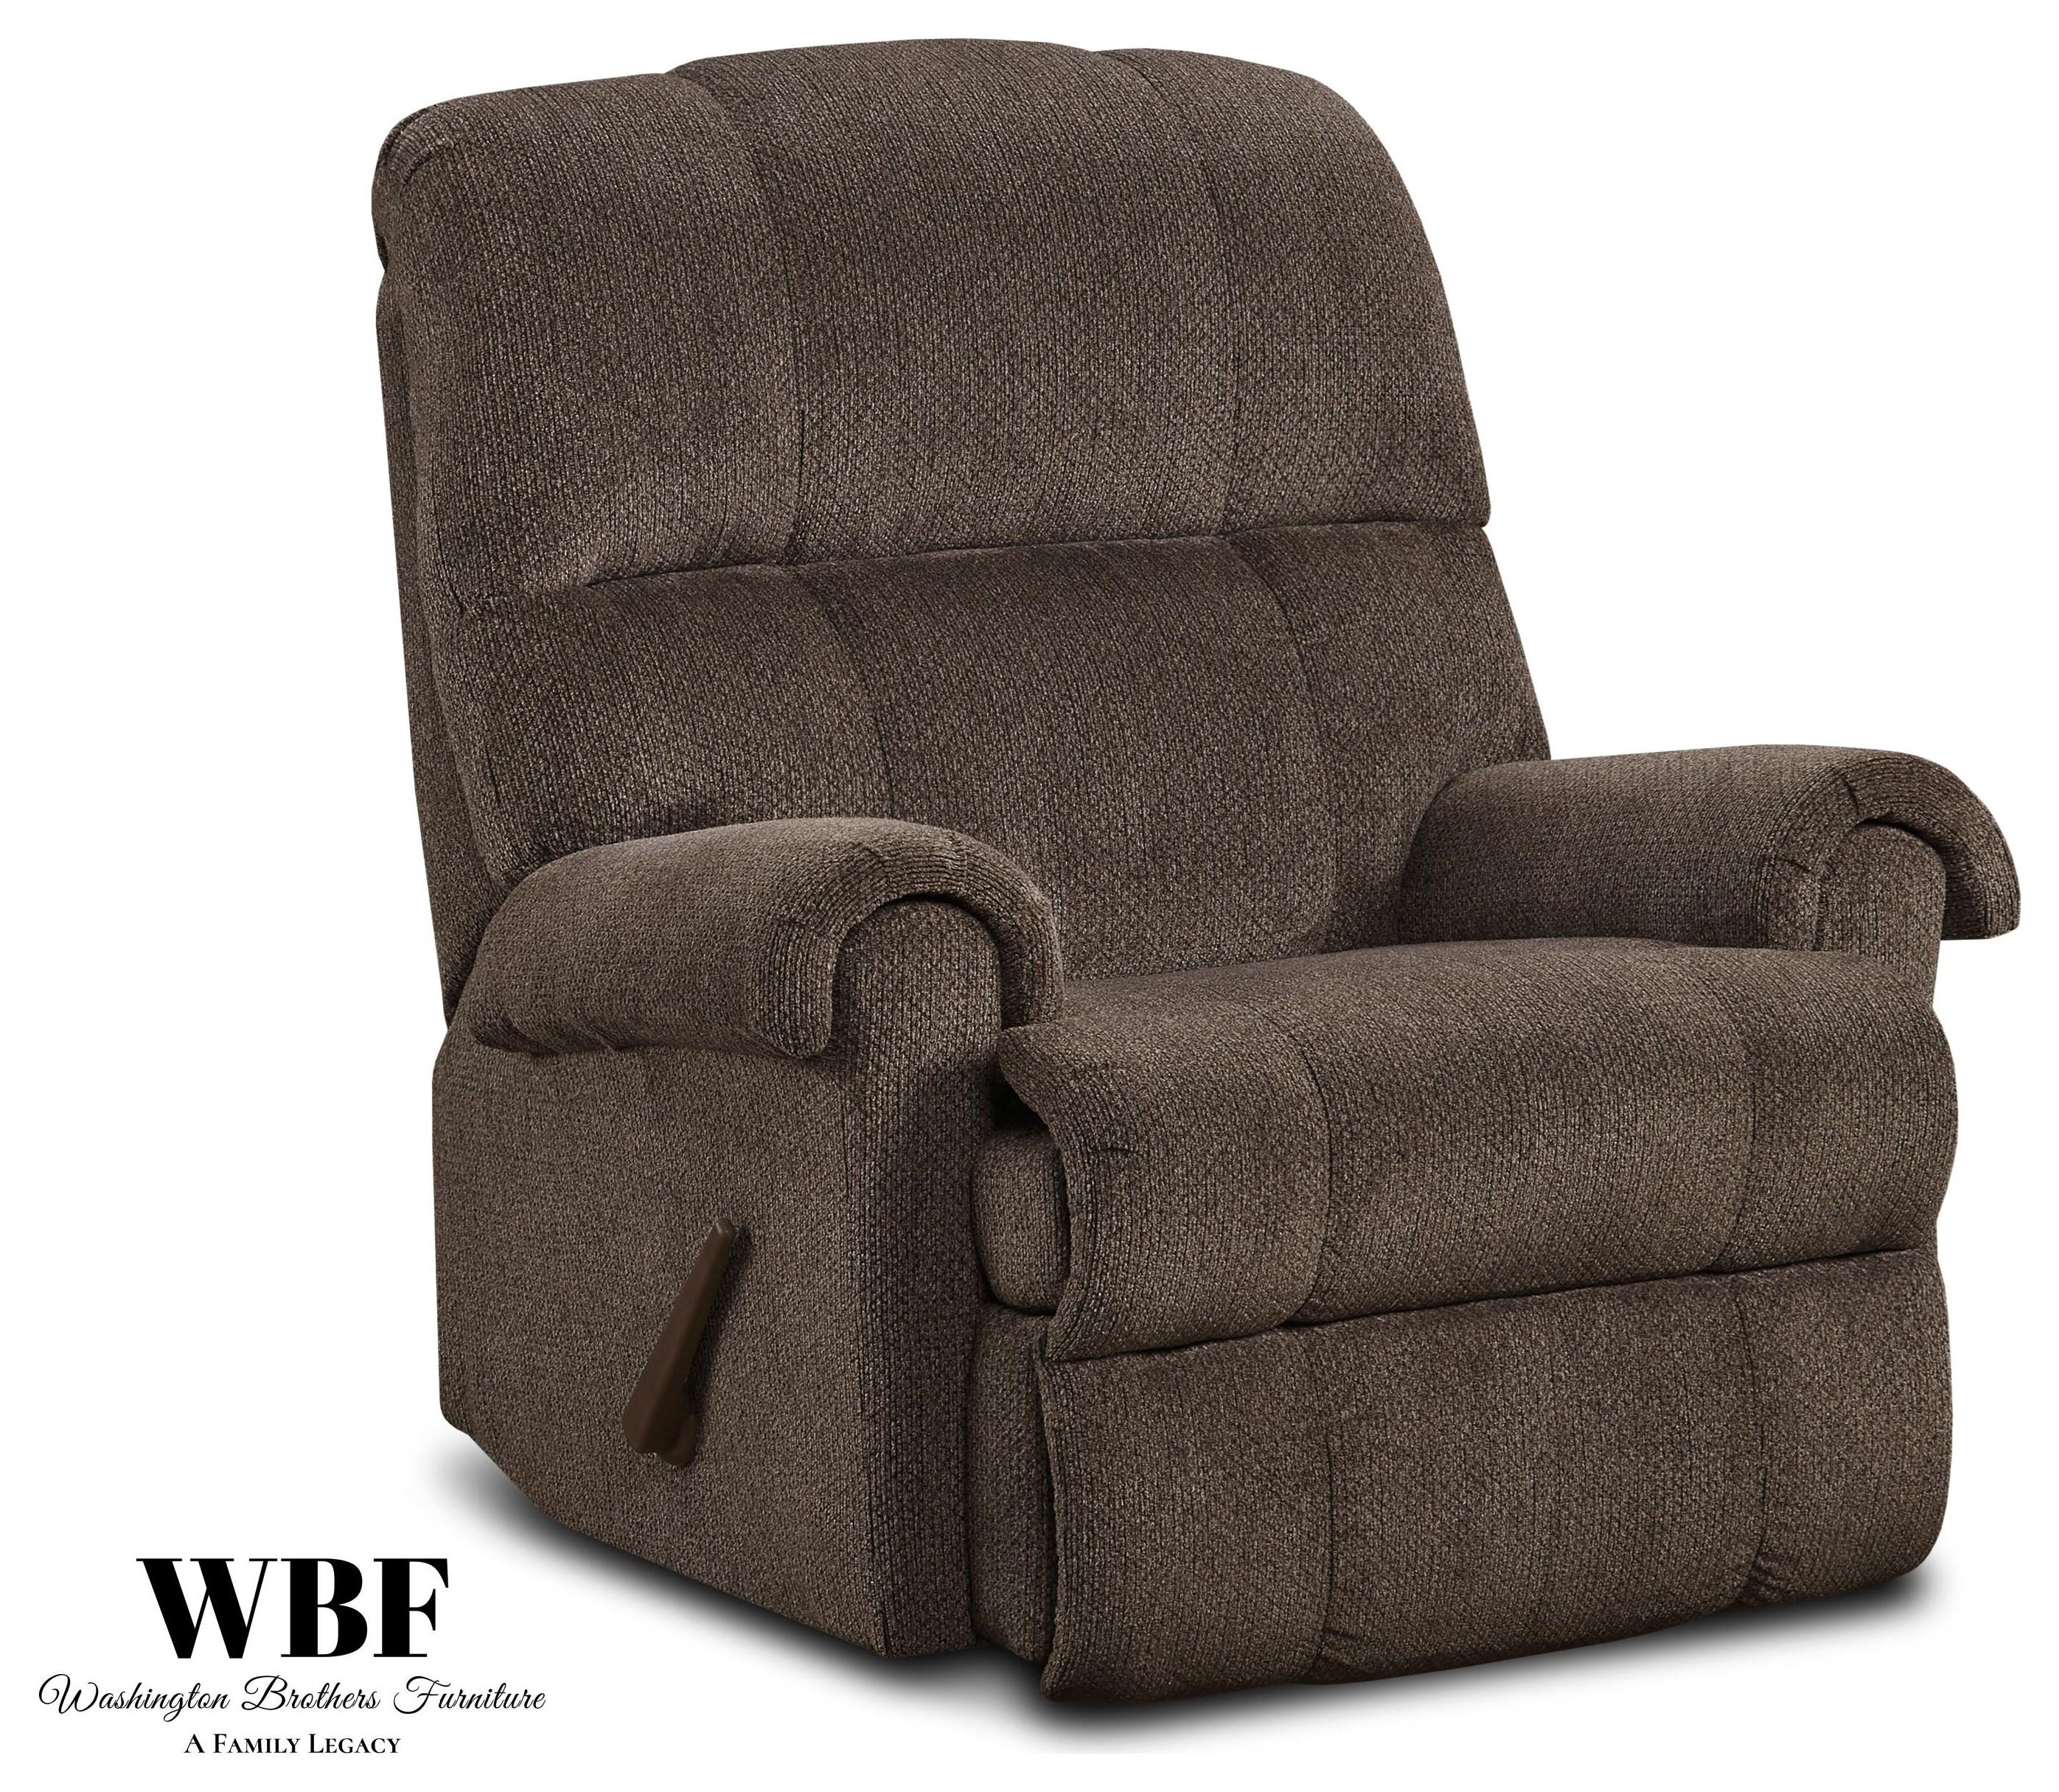 9010 Recliners Recliner- Chocolate by Washington Brothers Furniture at Furniture Fair - North Carolina